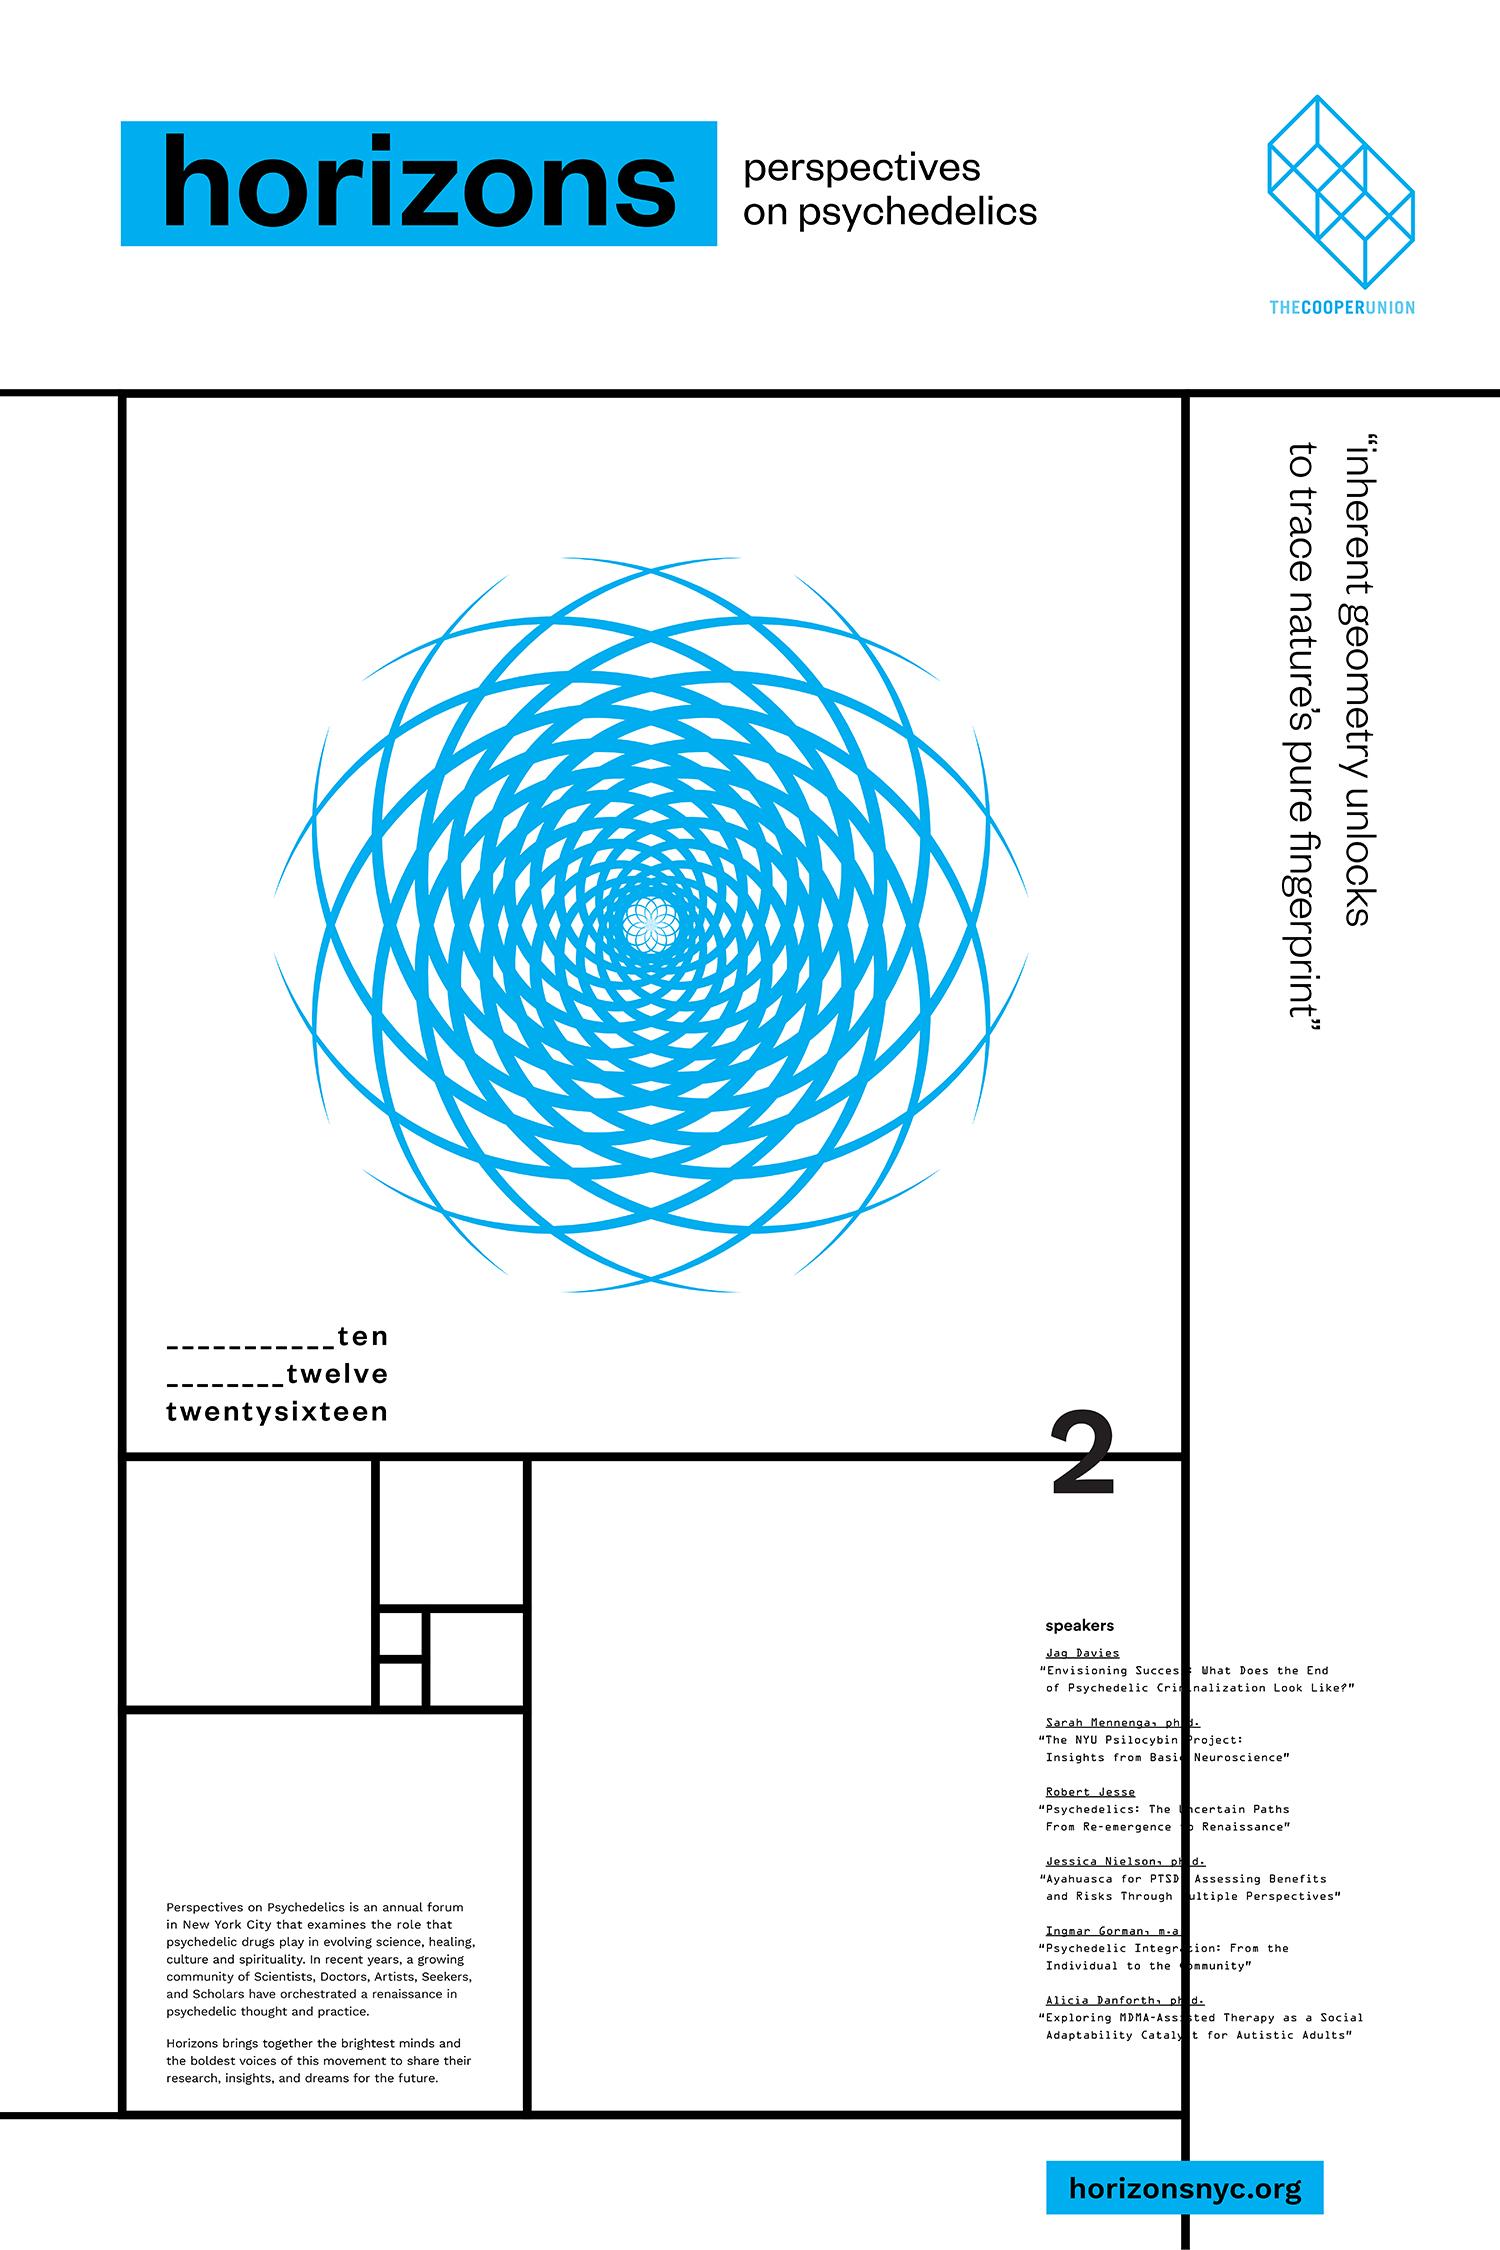 Horizons_Poster_Vert_001